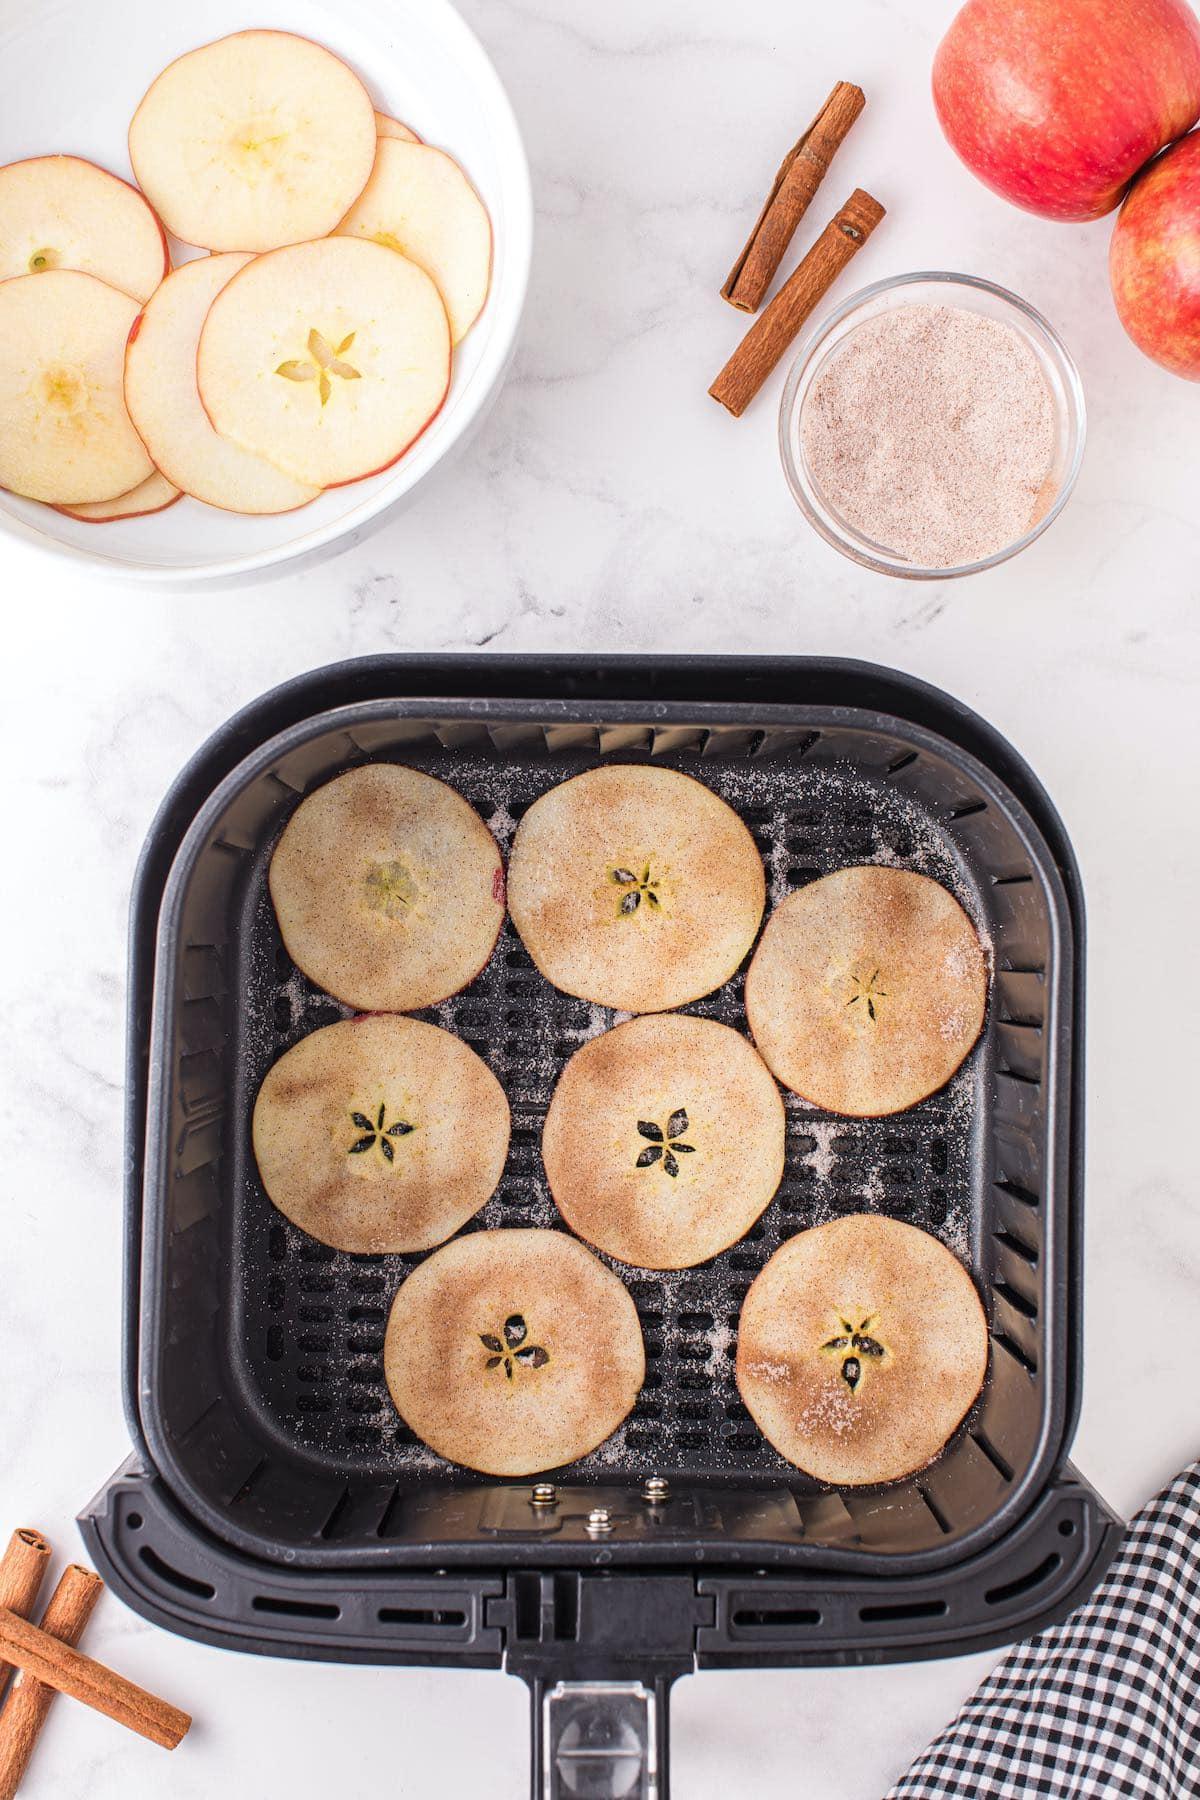 sprinkle cinnamon to the apple slices